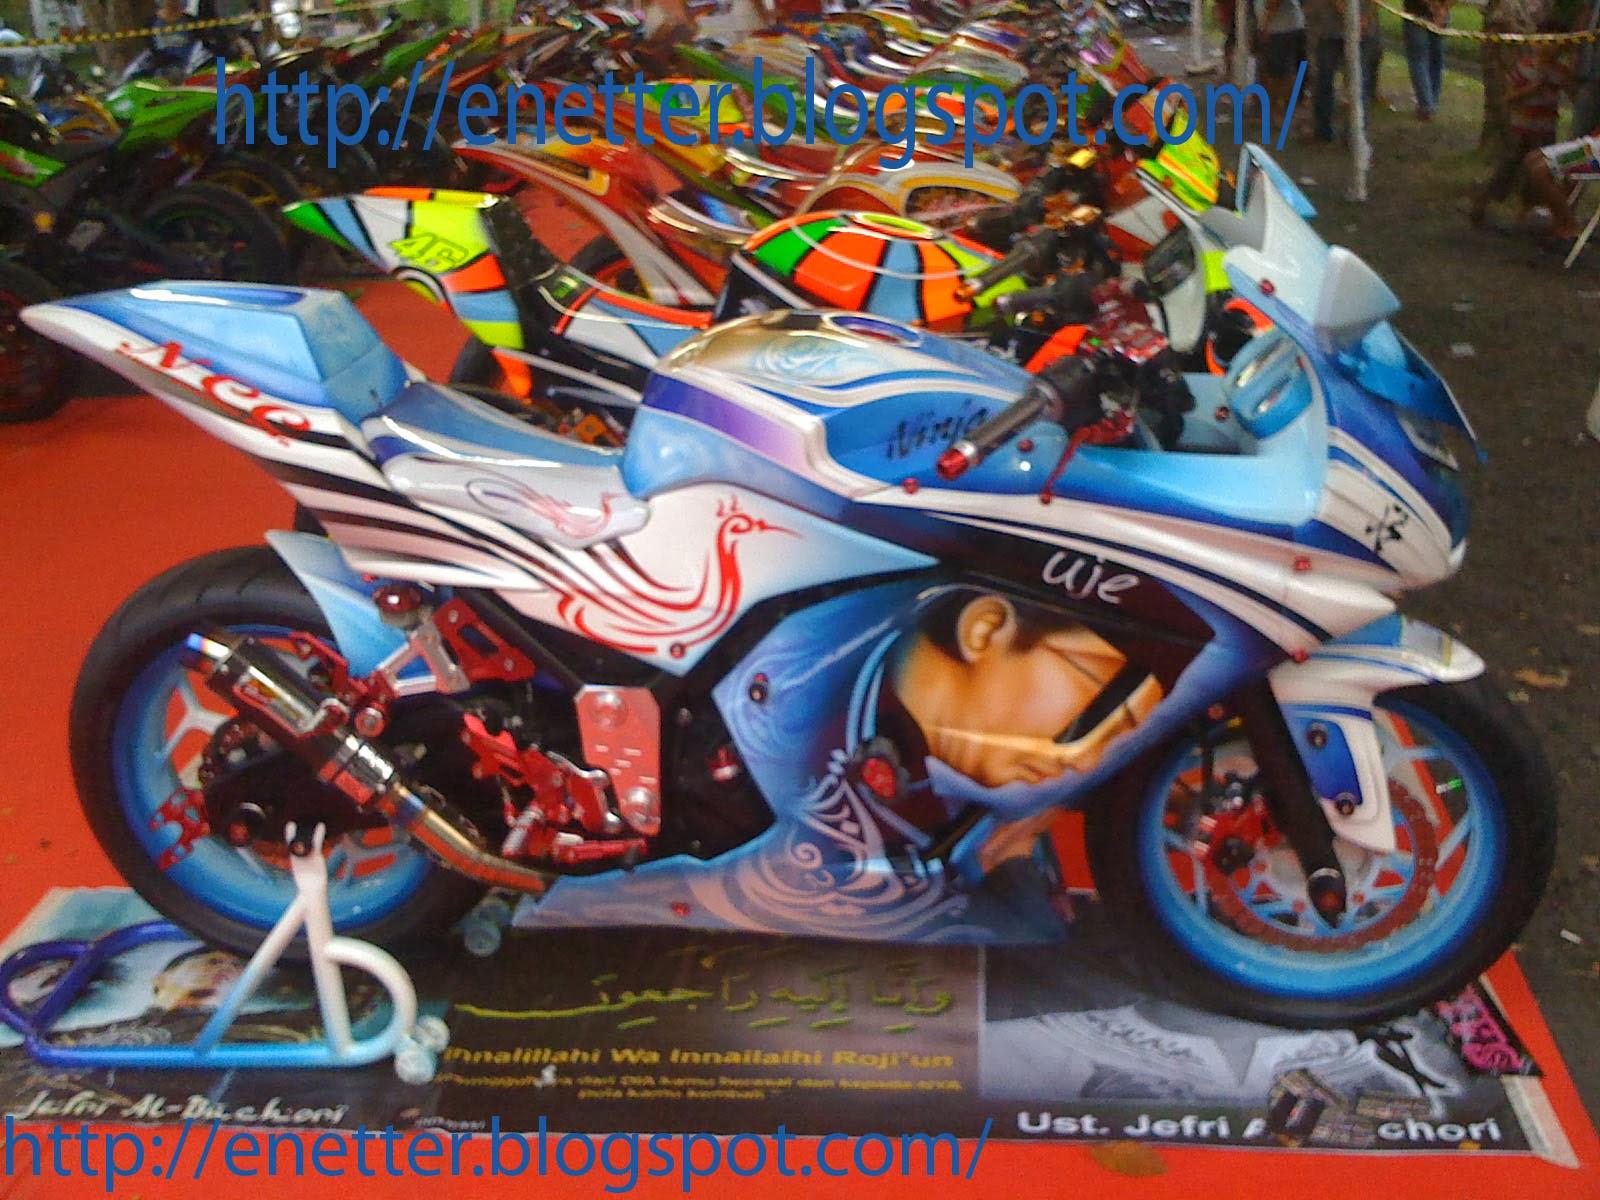 Kawasaki Ninja 250 style ustad uje